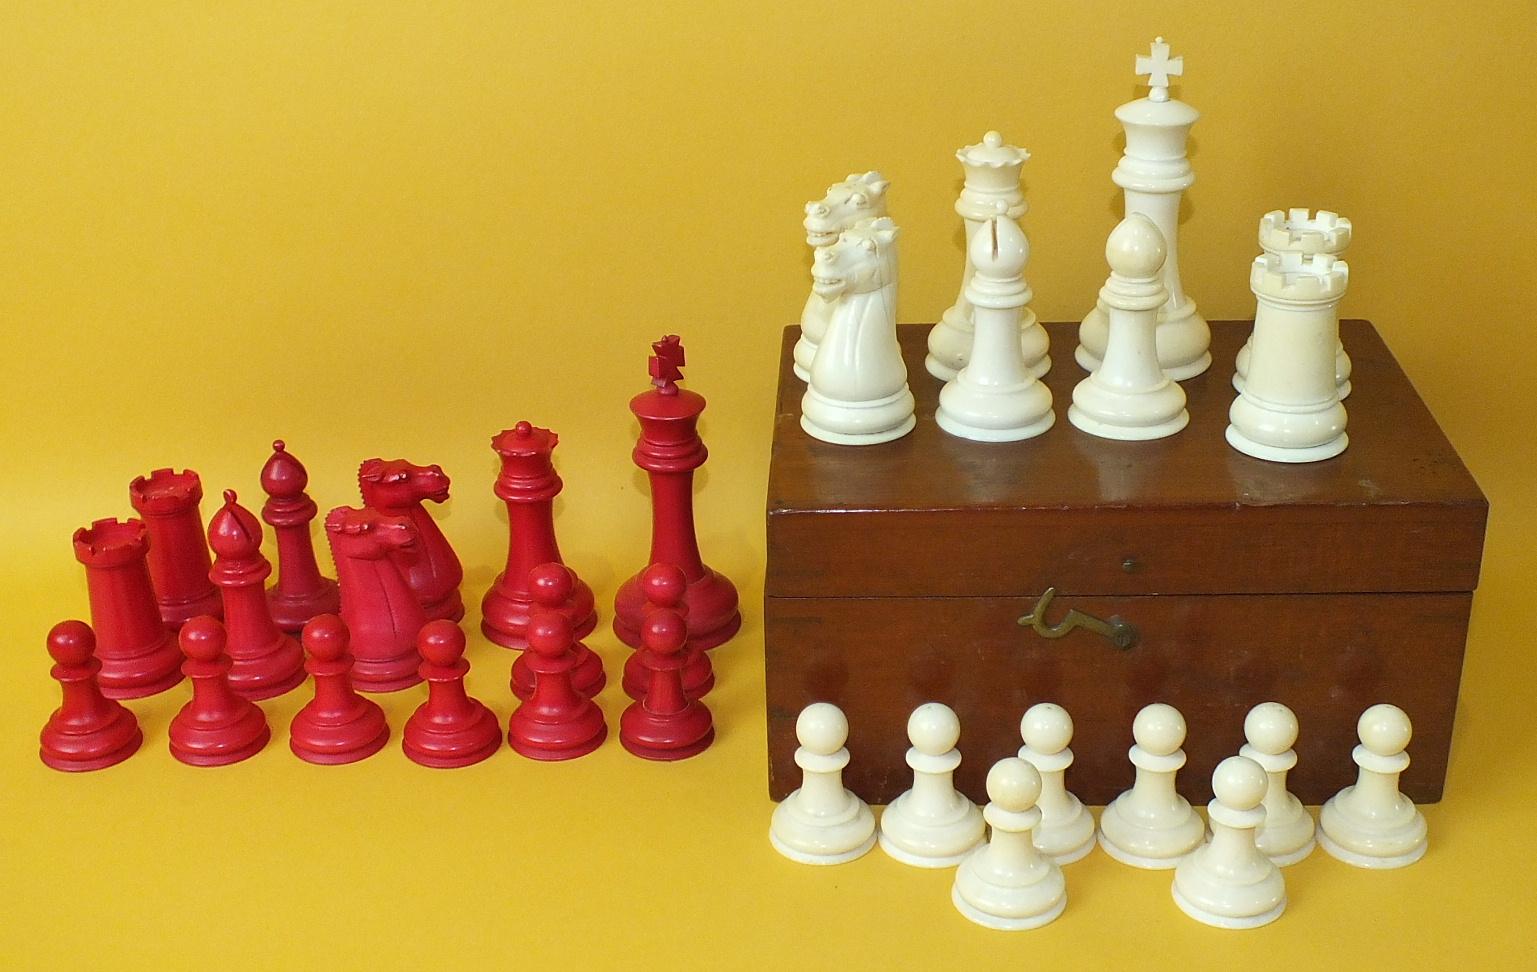 An Edwardian Staunton-style turned ivory chess set in rectangular walnut box, King 10cm.